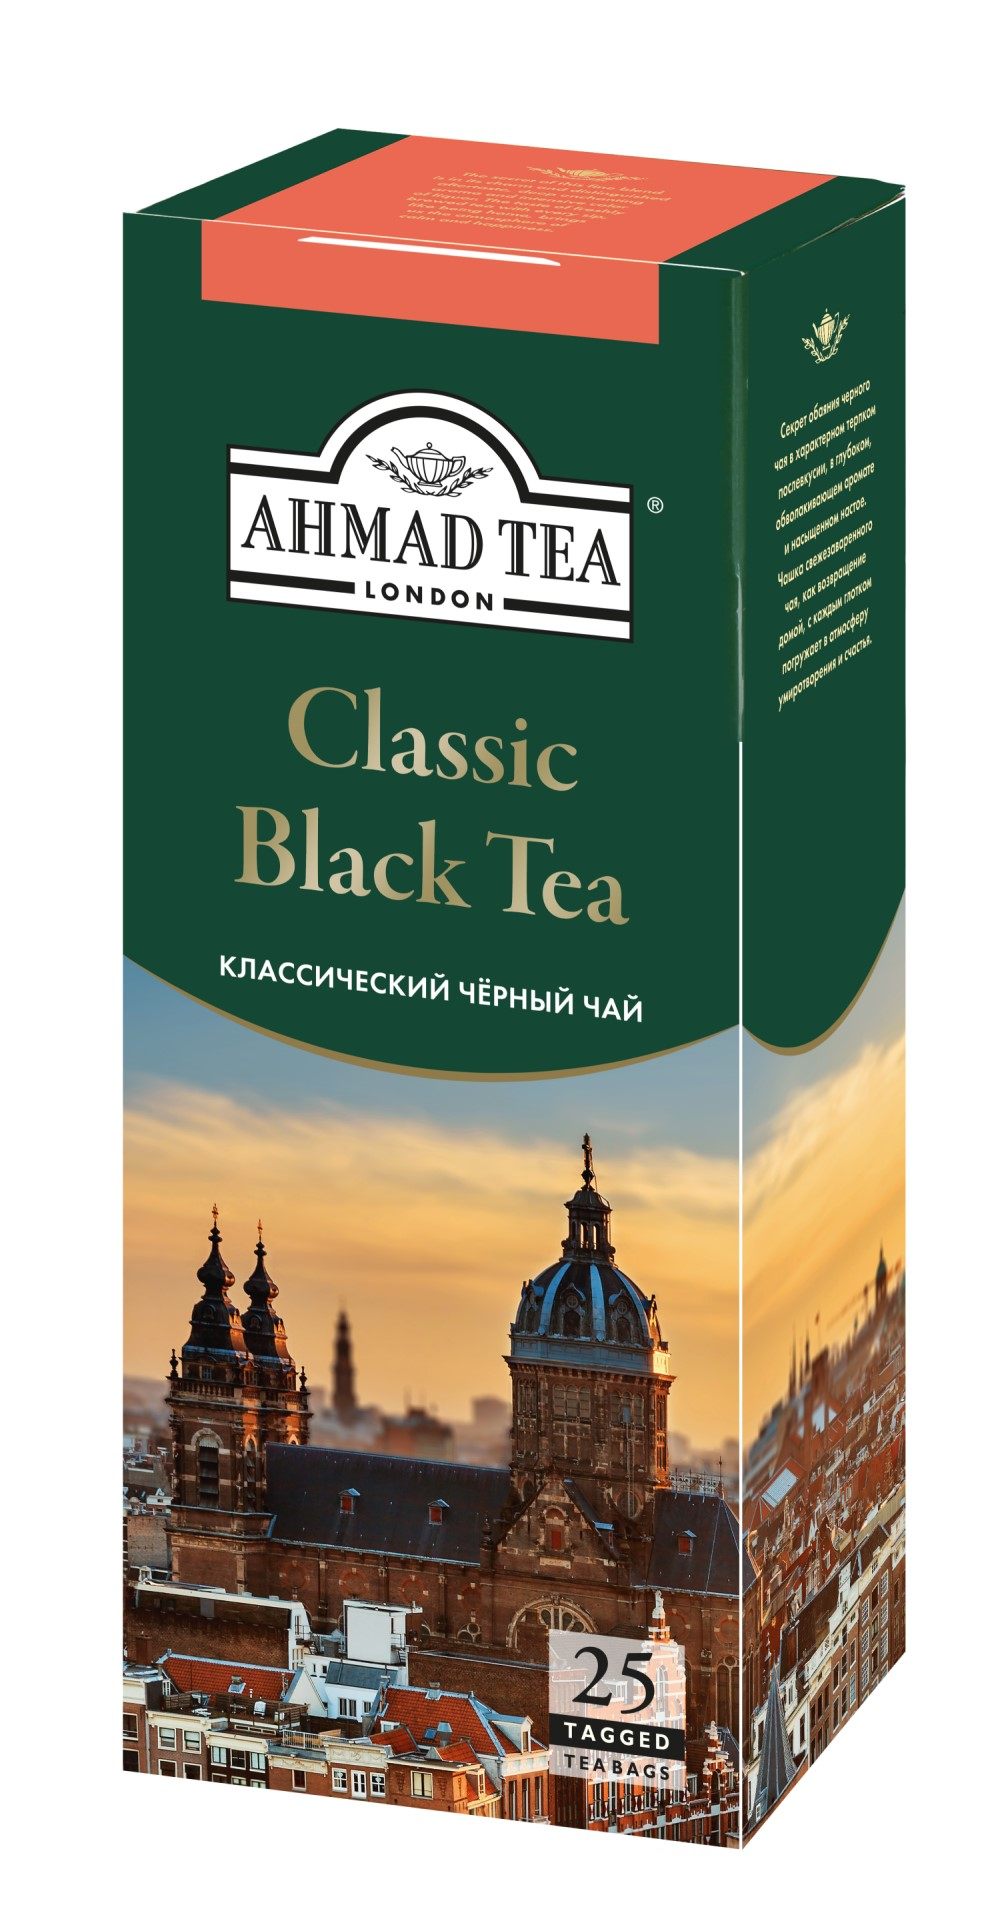 Ahmad Tea Чай Ahmad Tea черный классический 25 пакетиков